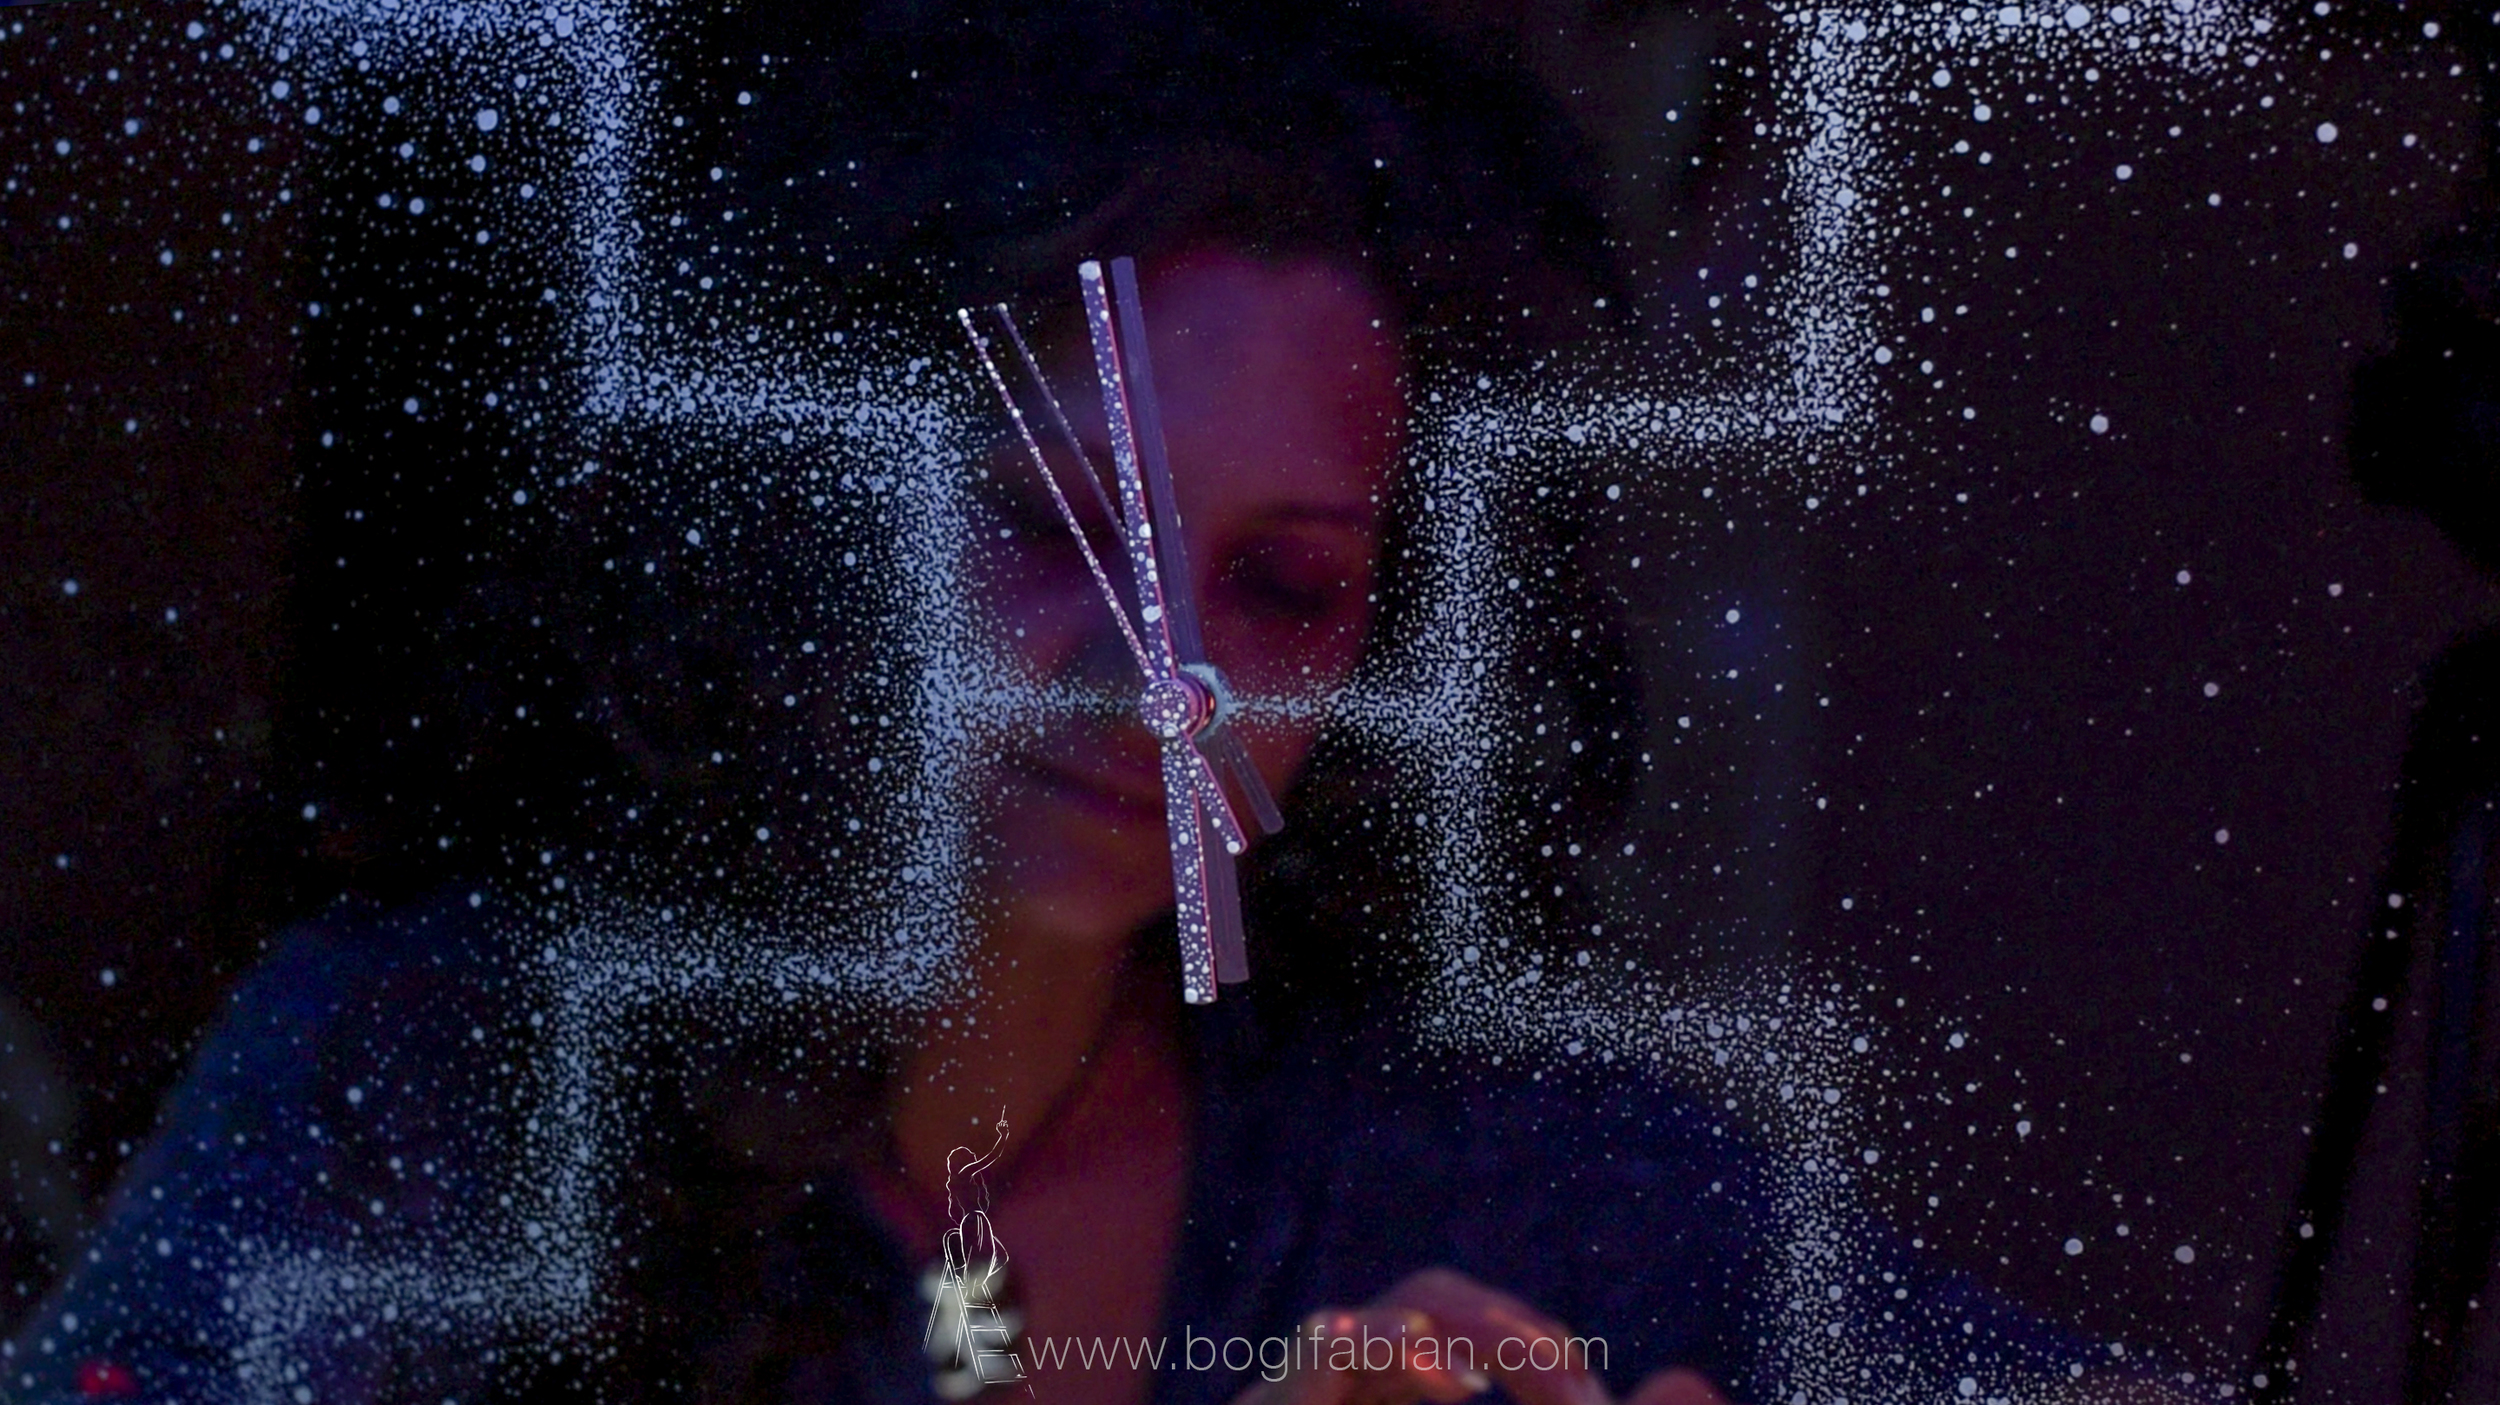 Bogi Fabian Glow in the dark mirror clock etznab